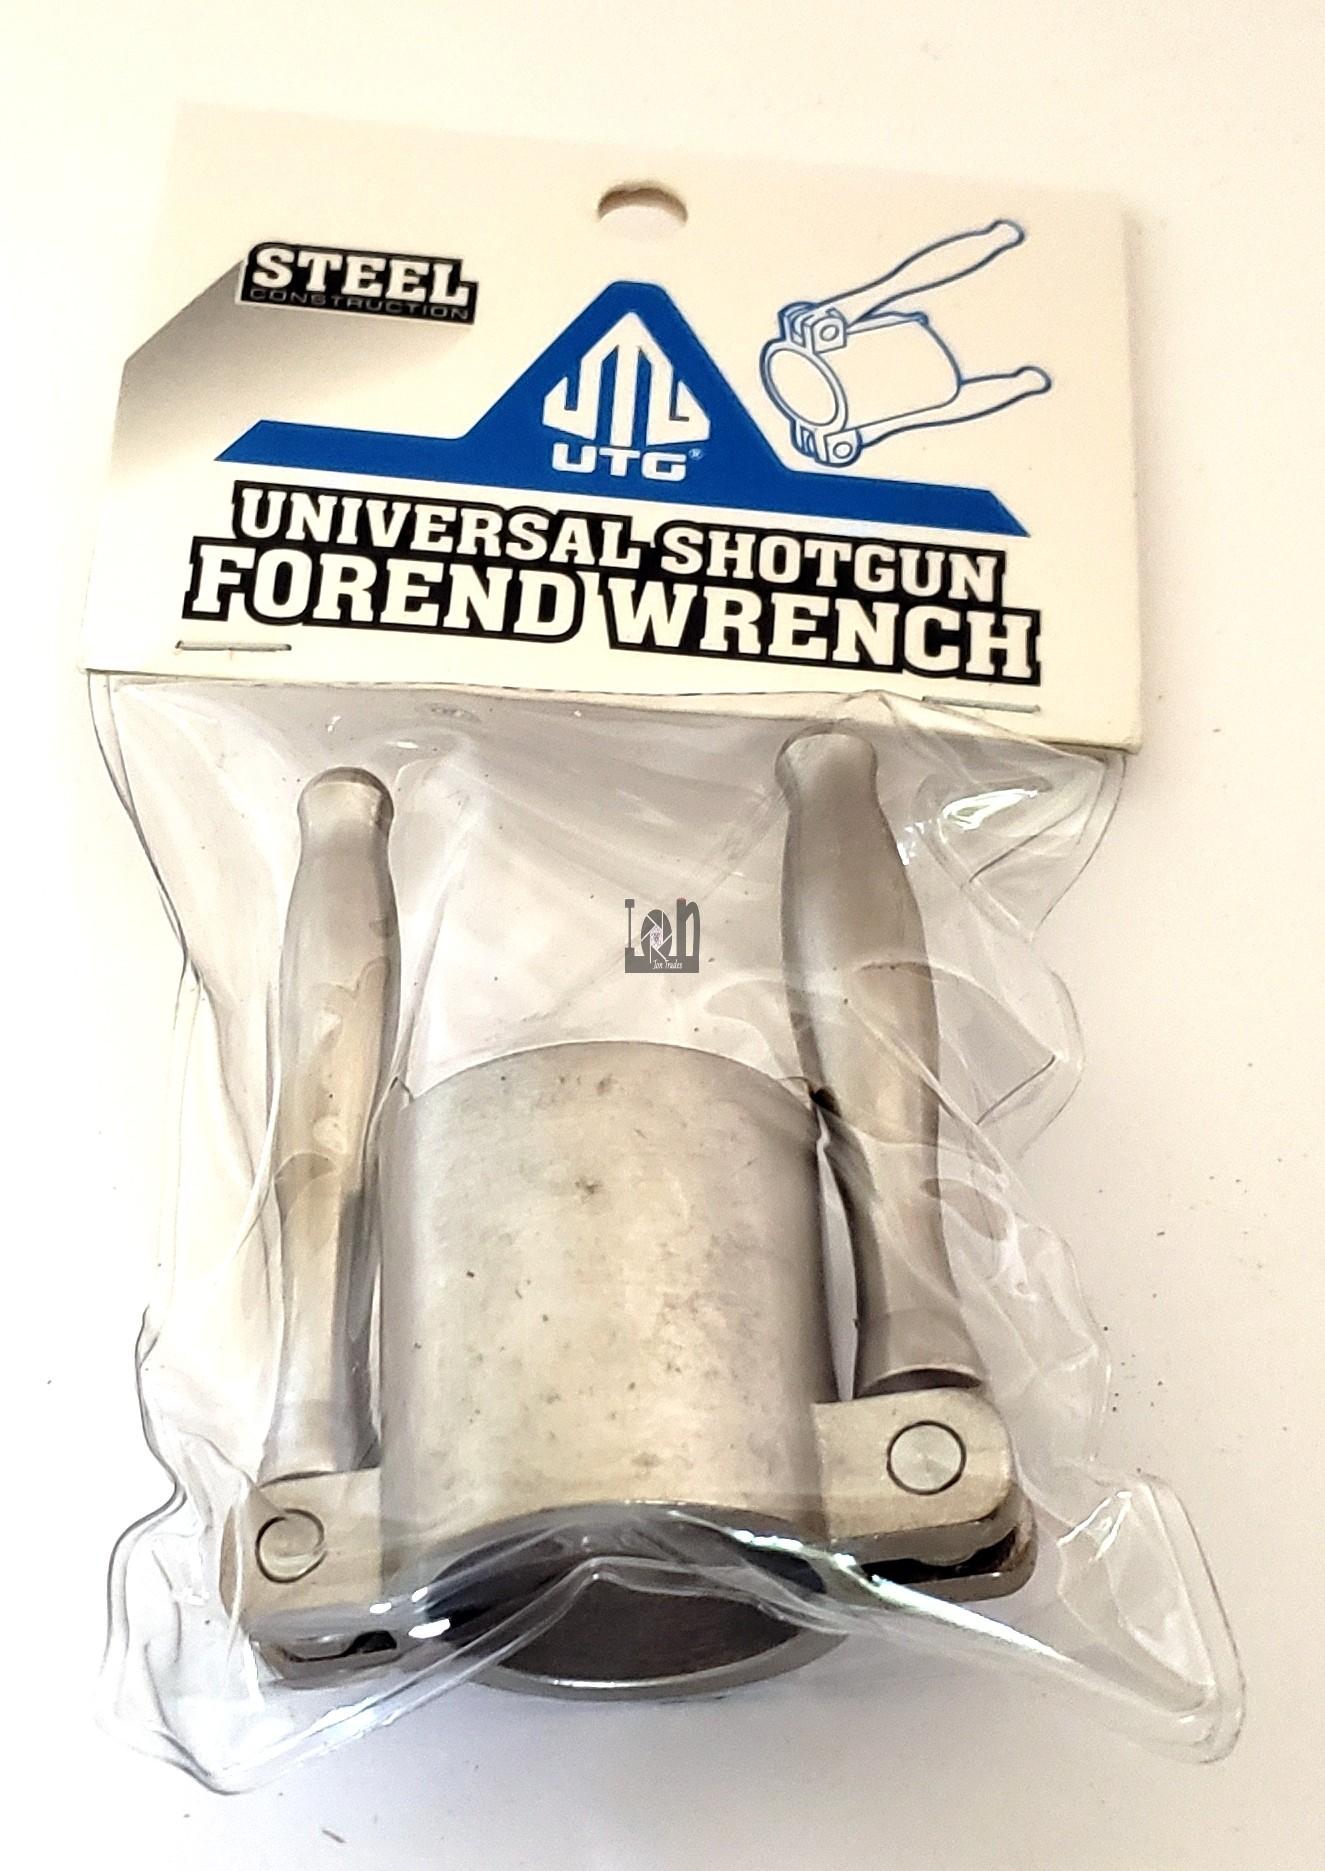 UTG Deluxe Universal Shotgun Forend Wrench Tool